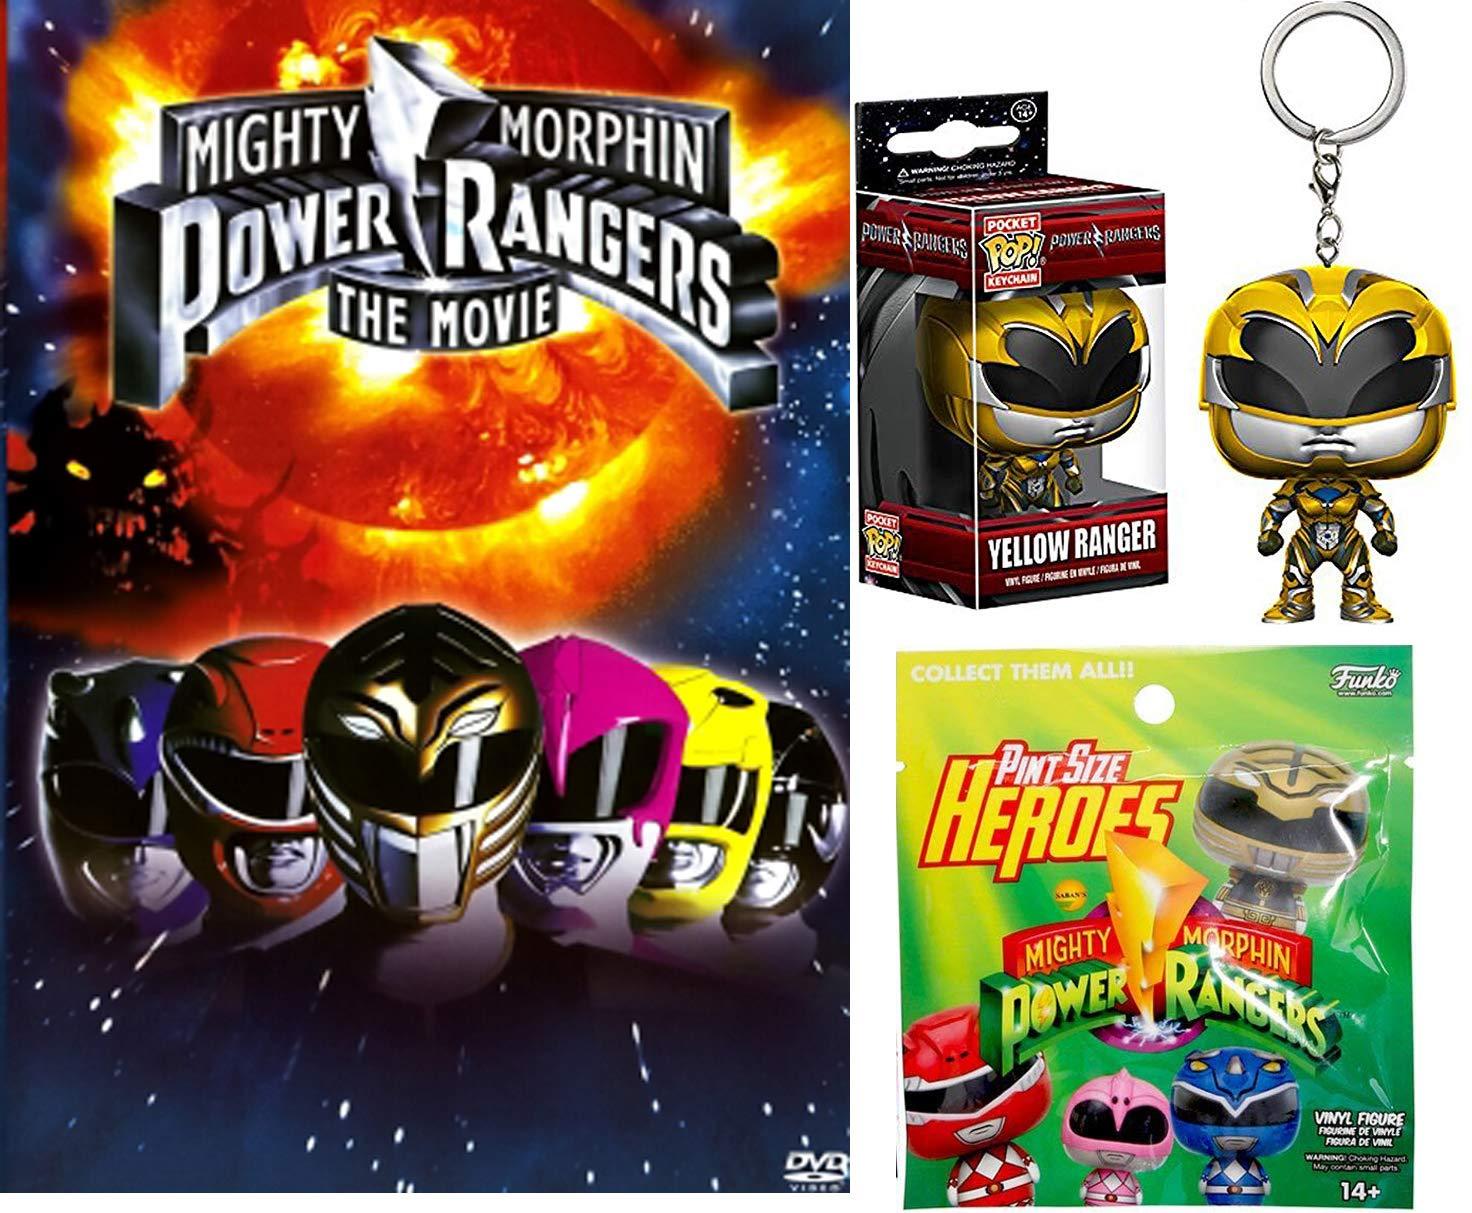 Yellow Power Ranger Pocket Keychain + Mighty Morphin Power Rangers The Movie DVD Pop Figure Pack W/ Bonus Pint Size Heroes Blind Bag